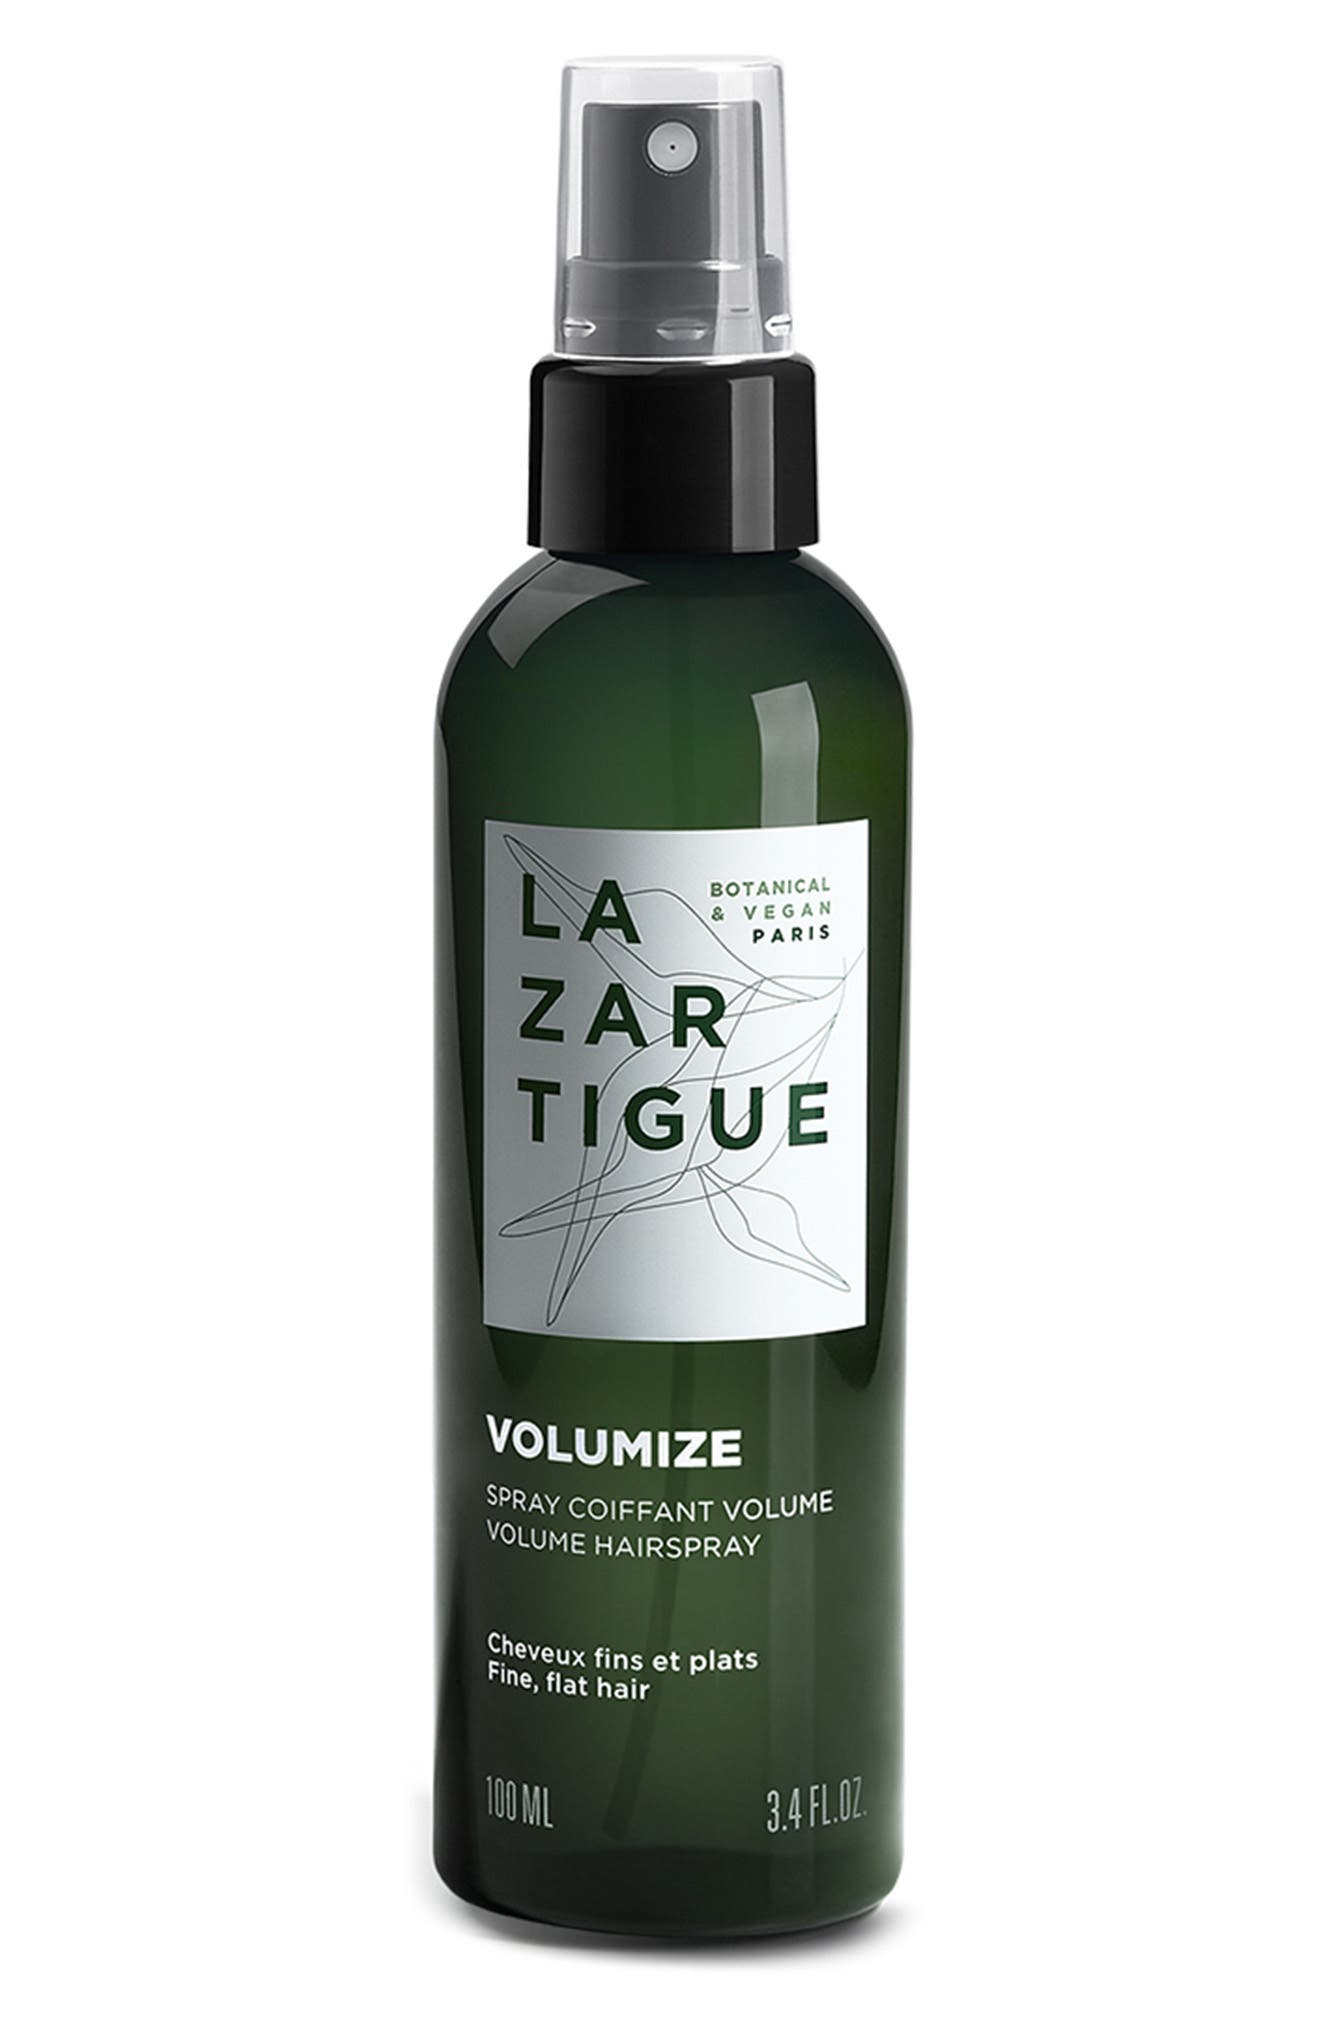 Volumize Spray Hairspray